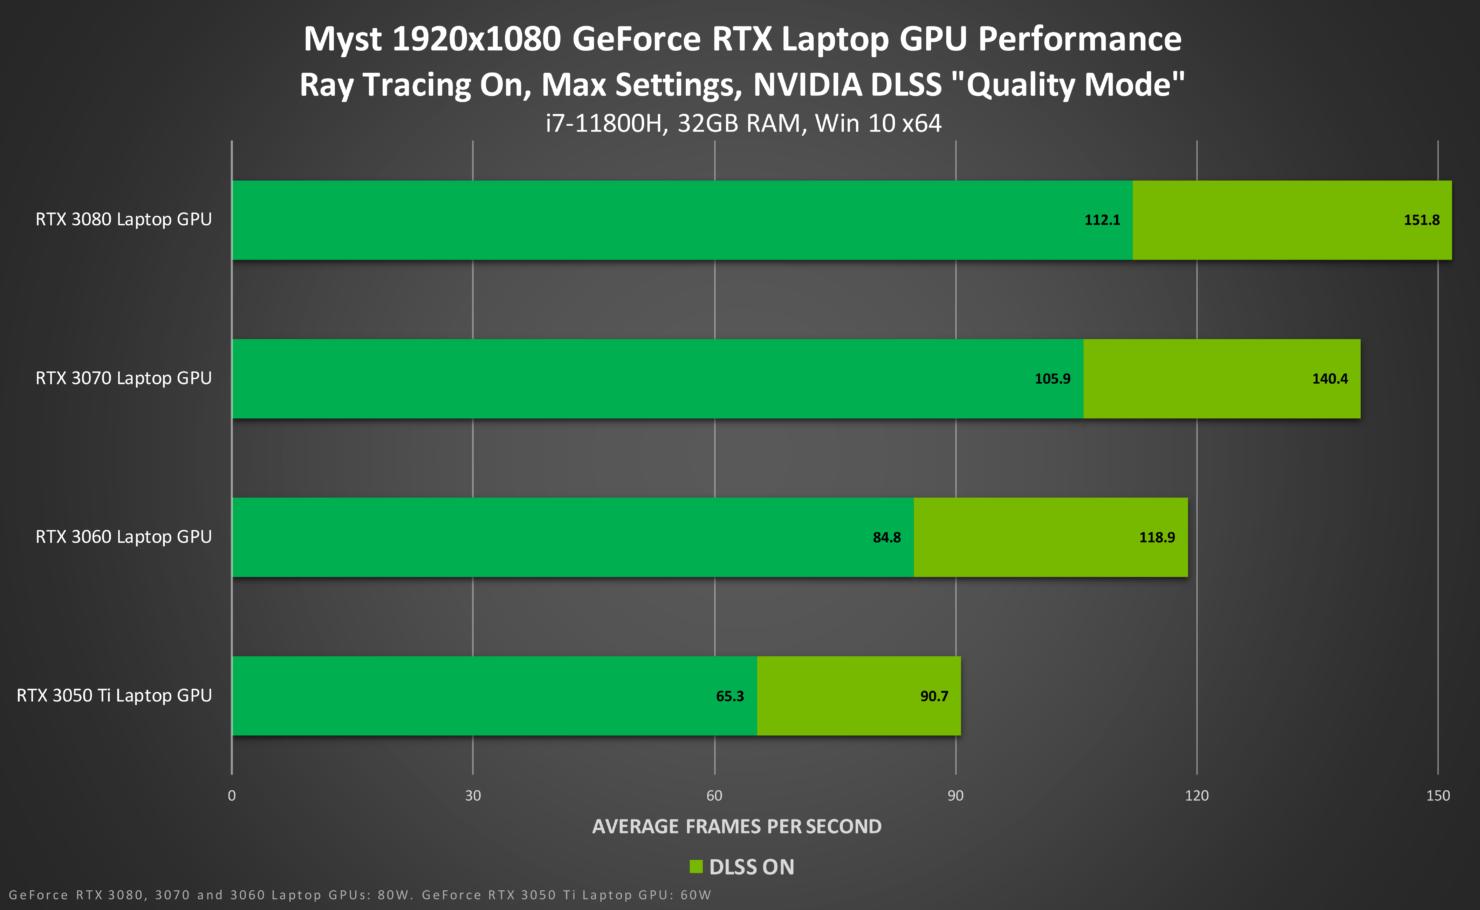 myst-geforce-rtx-1920x1080-ray-tracing-on-nvidia-dlss-laptop-gpu-performance